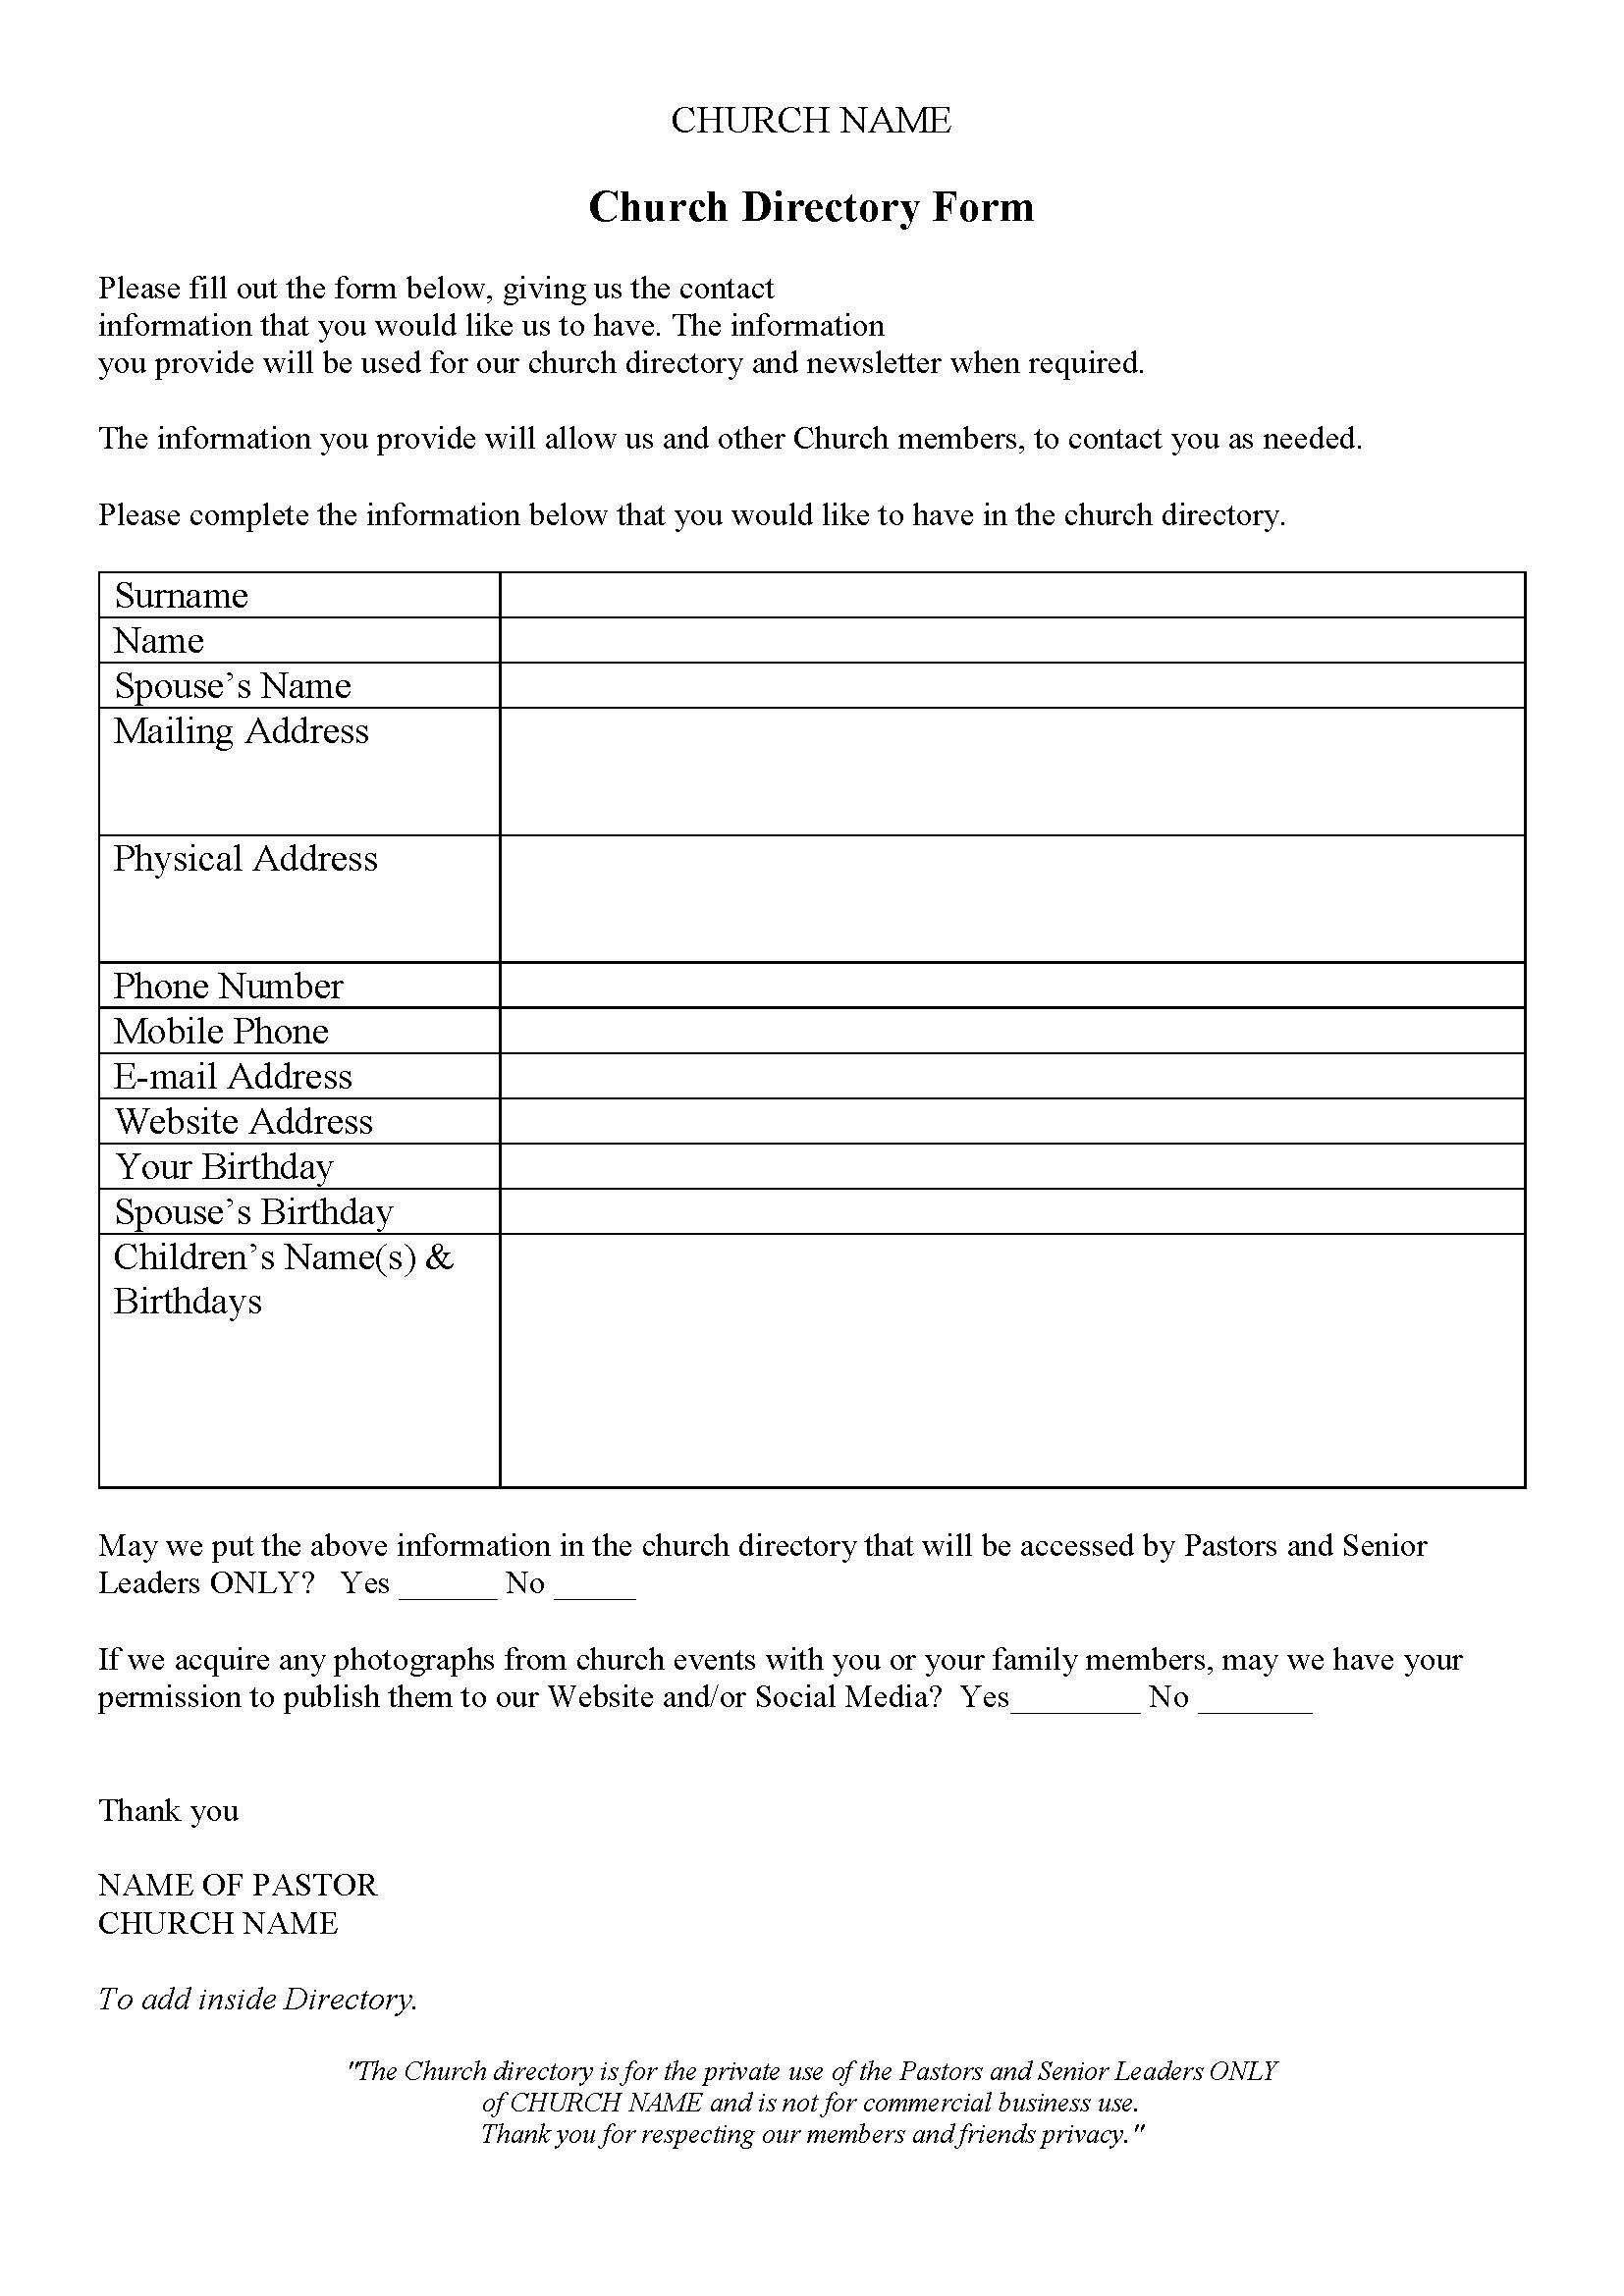 Church Directory | Church Directory Ideas | Church Outreach, Church - Free Printable Church Directory Template